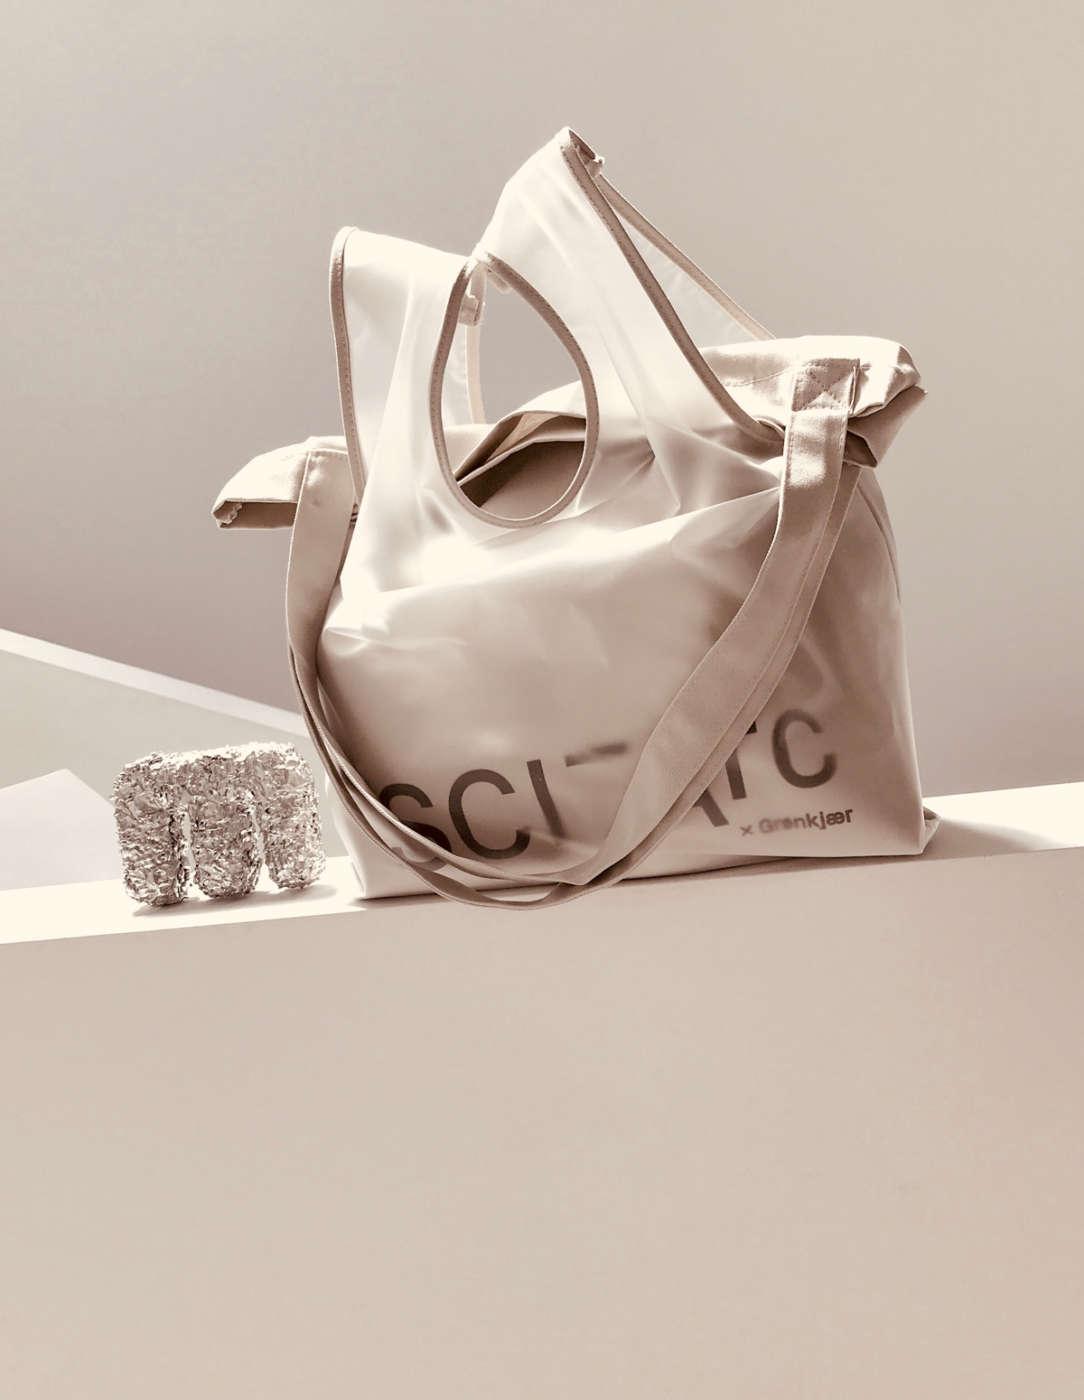 sci arc grey bag merchandise